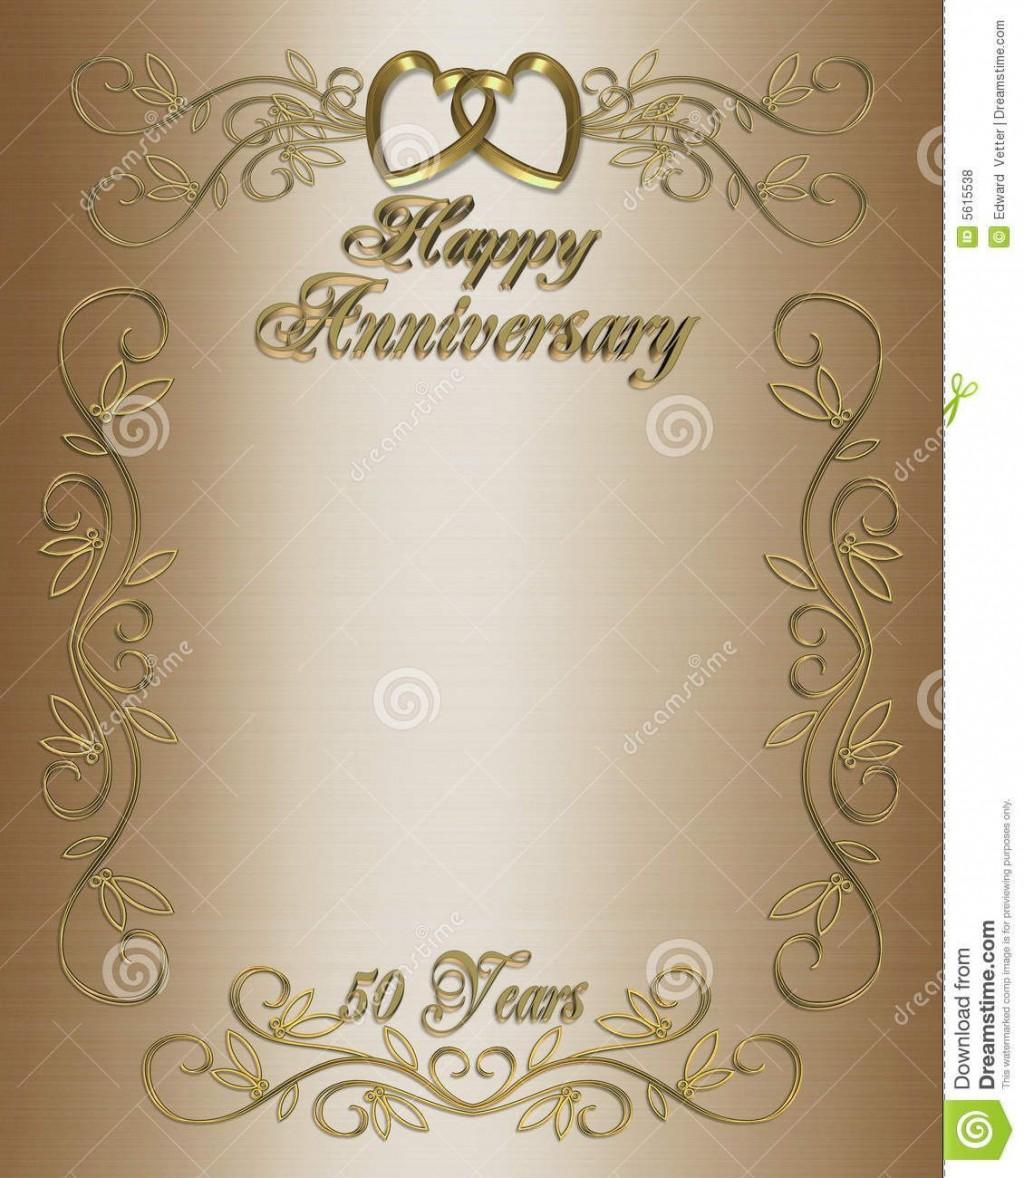 003 Striking 50th Anniversary Invitation Card Template Design  Templates FreeLarge